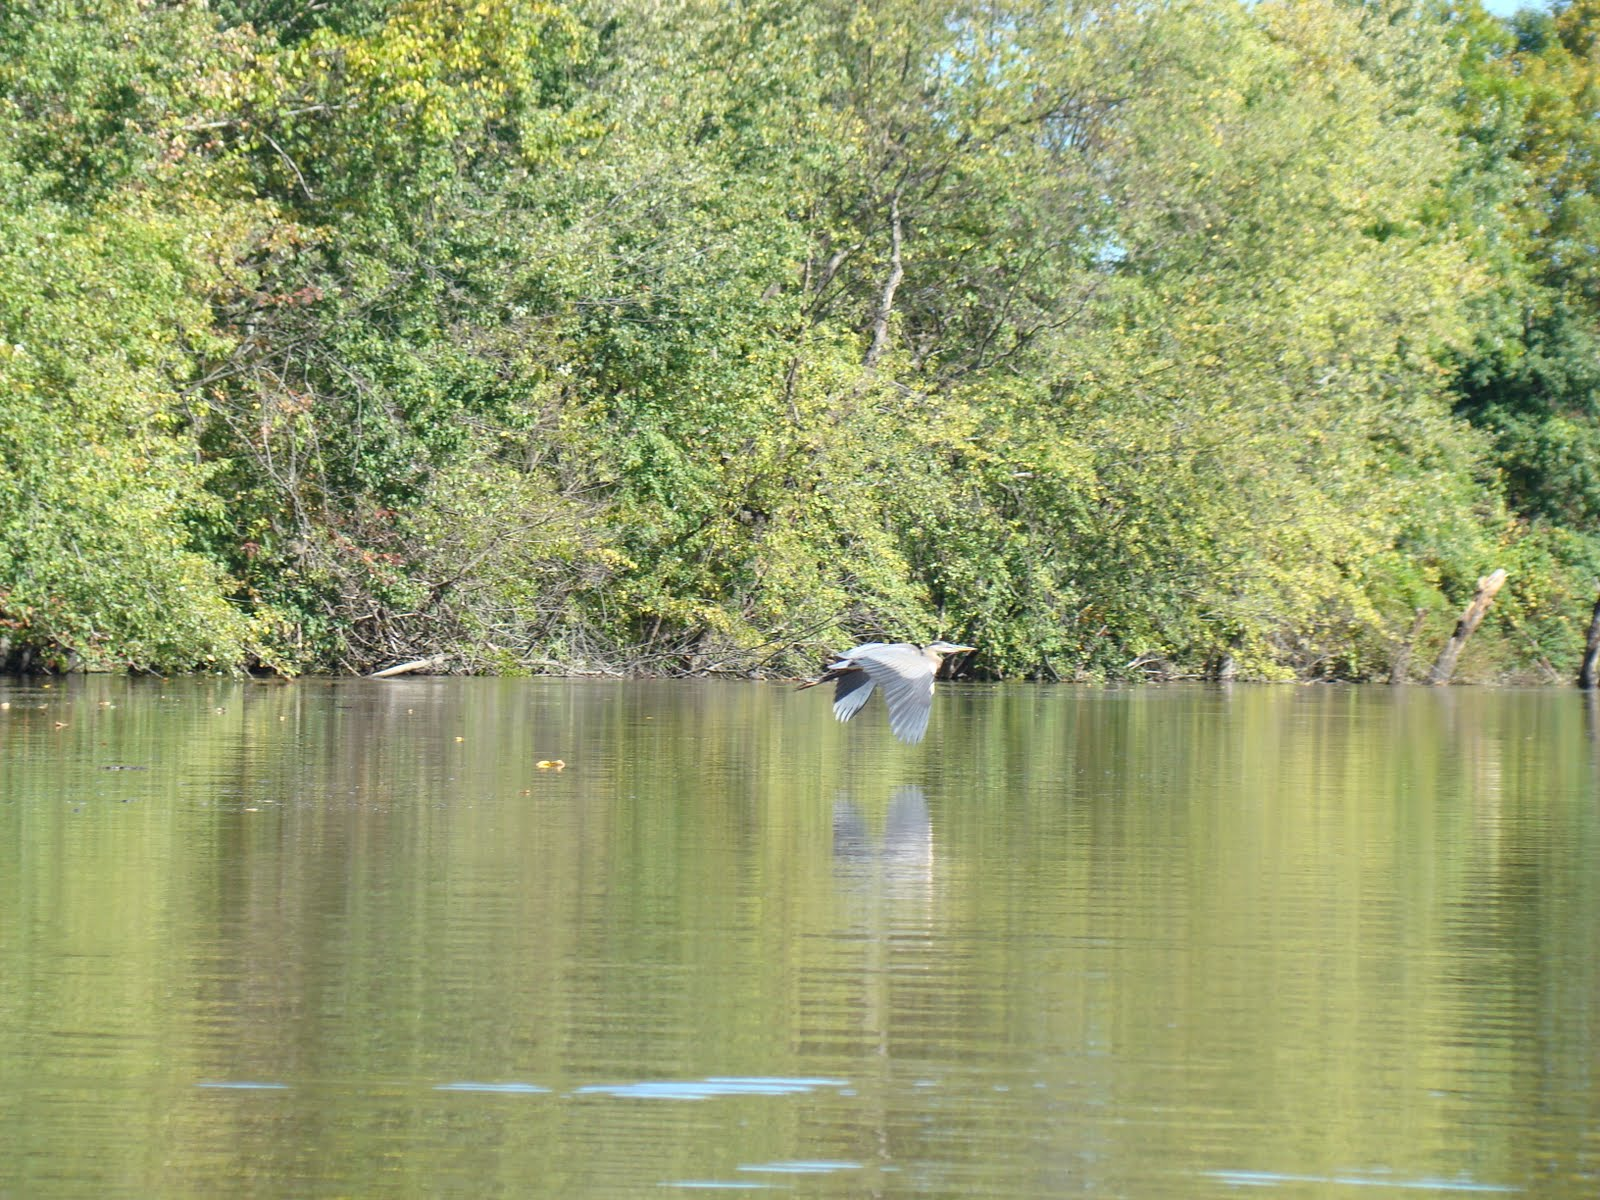 Kayak Northeast: Wallkill River (New Paltz to Covered Bridge (Rt 32